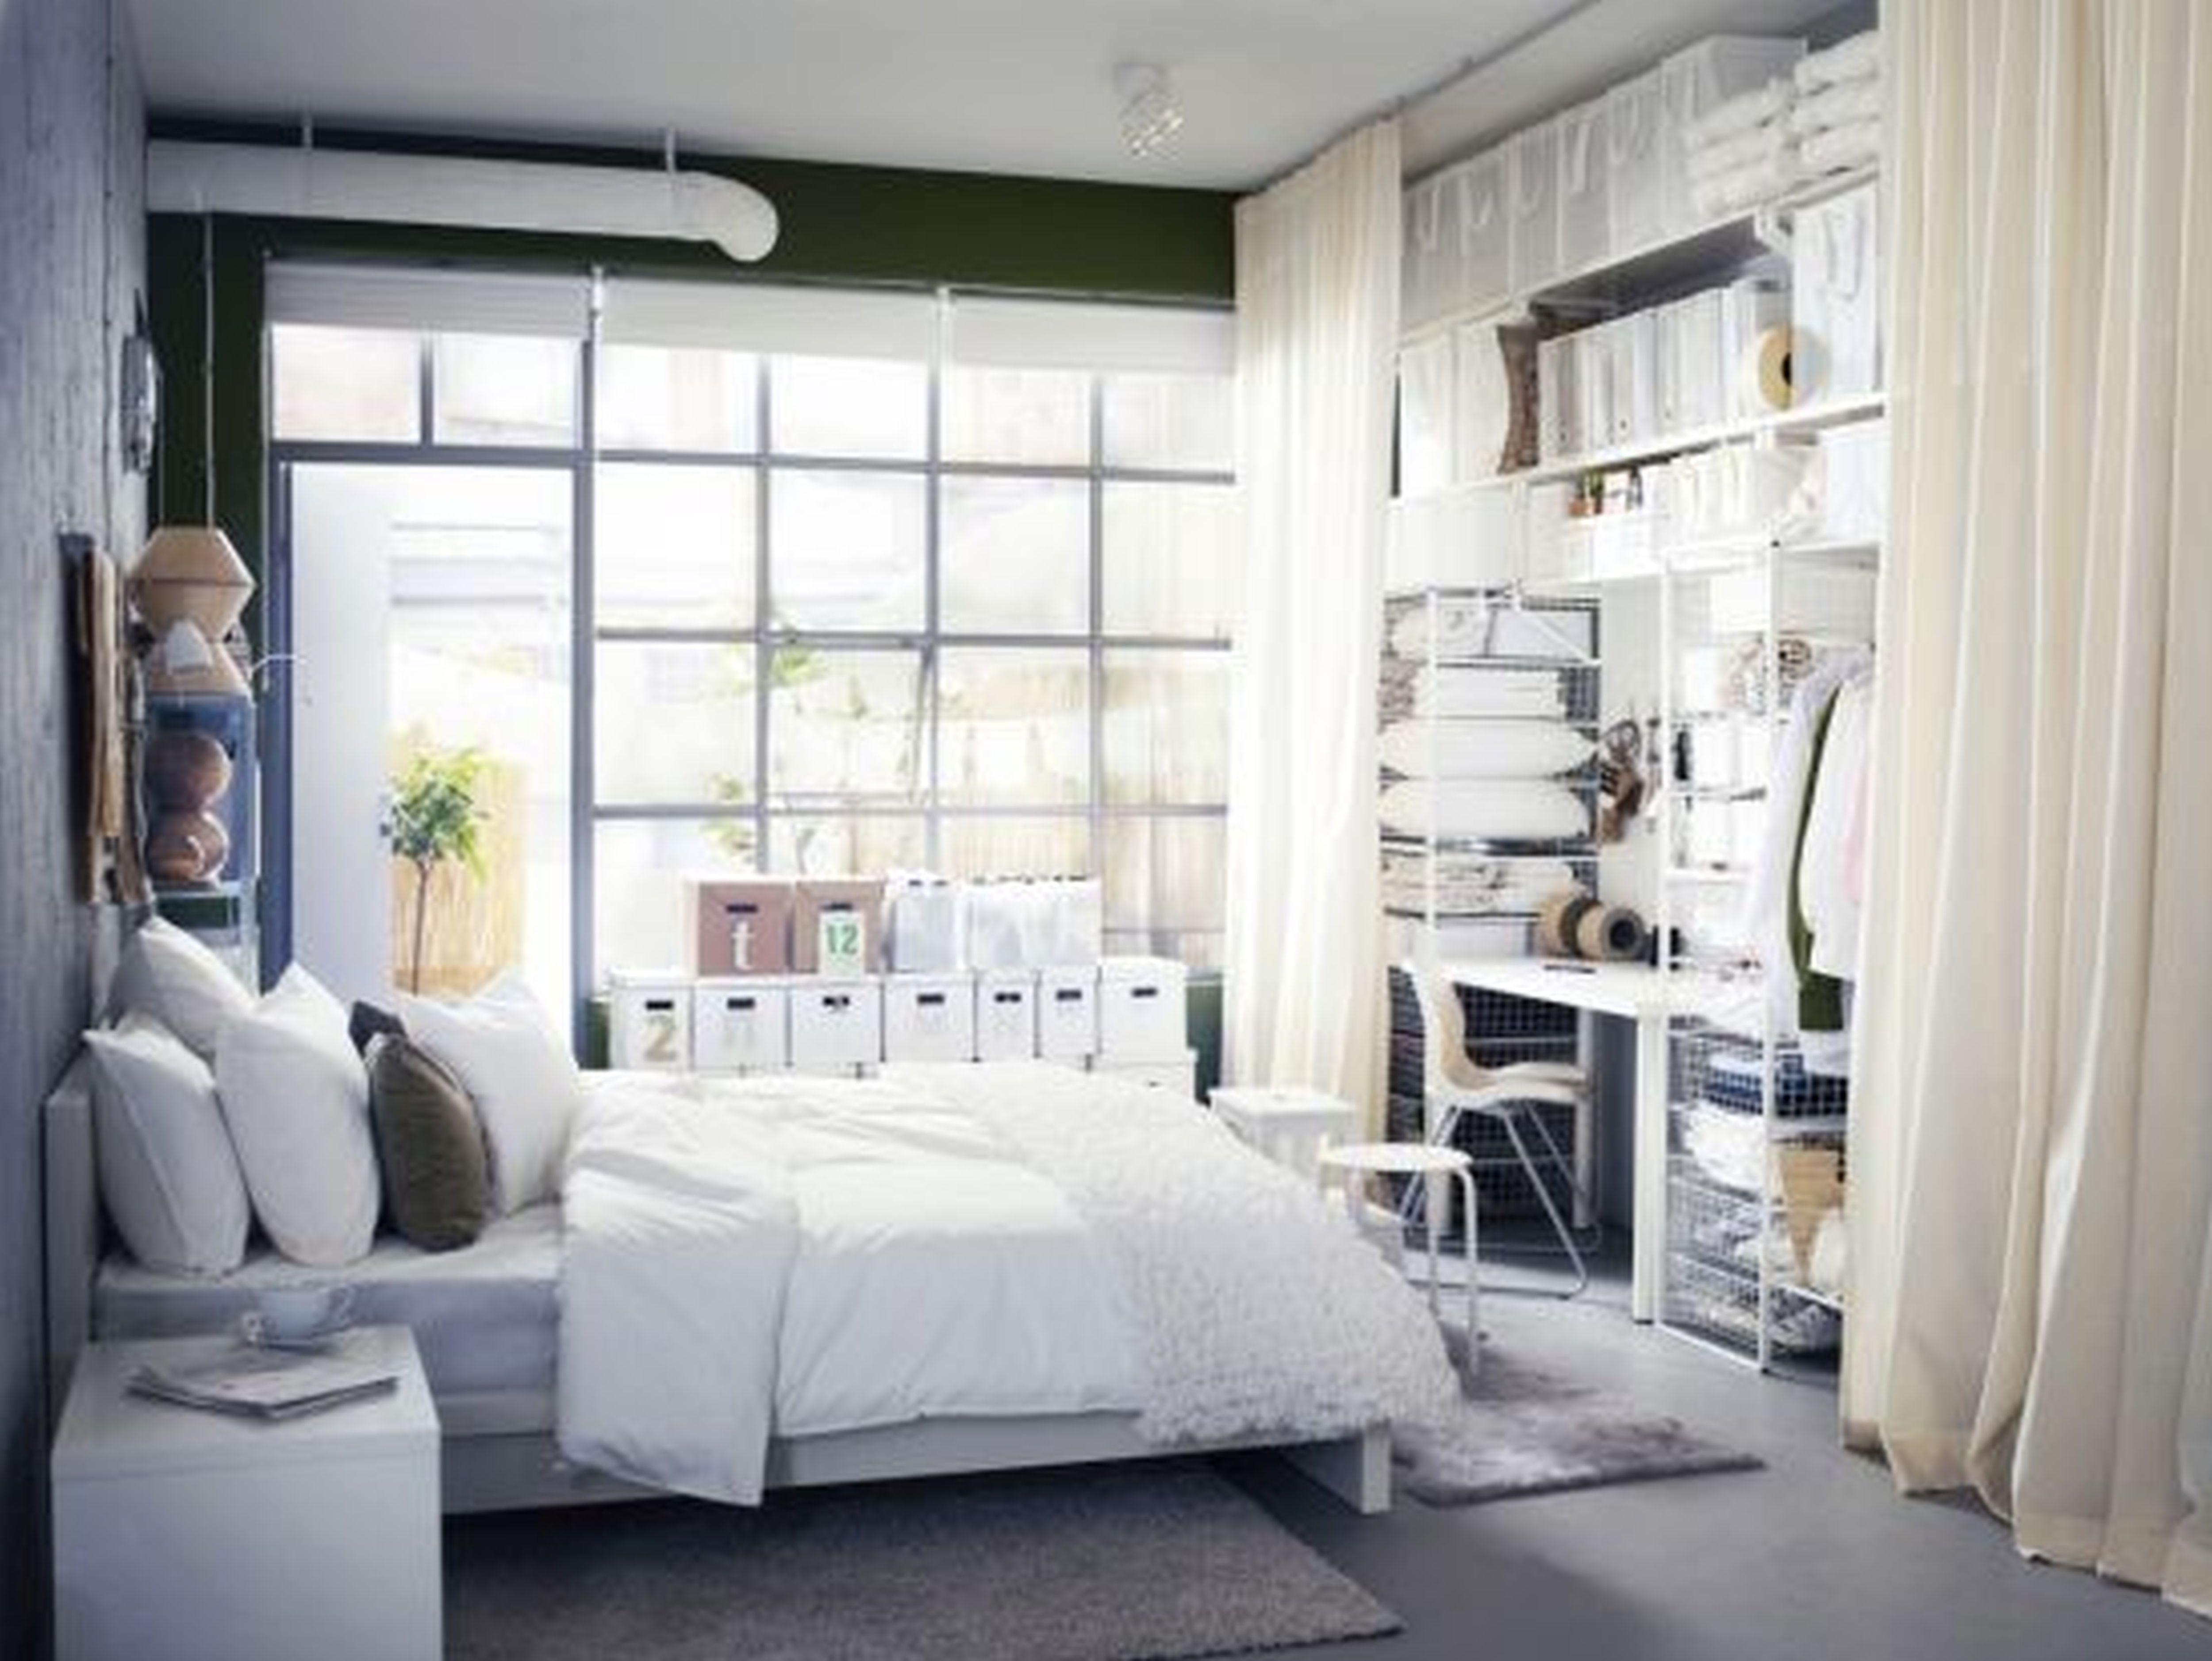 White Bedroom IKEA (View 5 of 10)